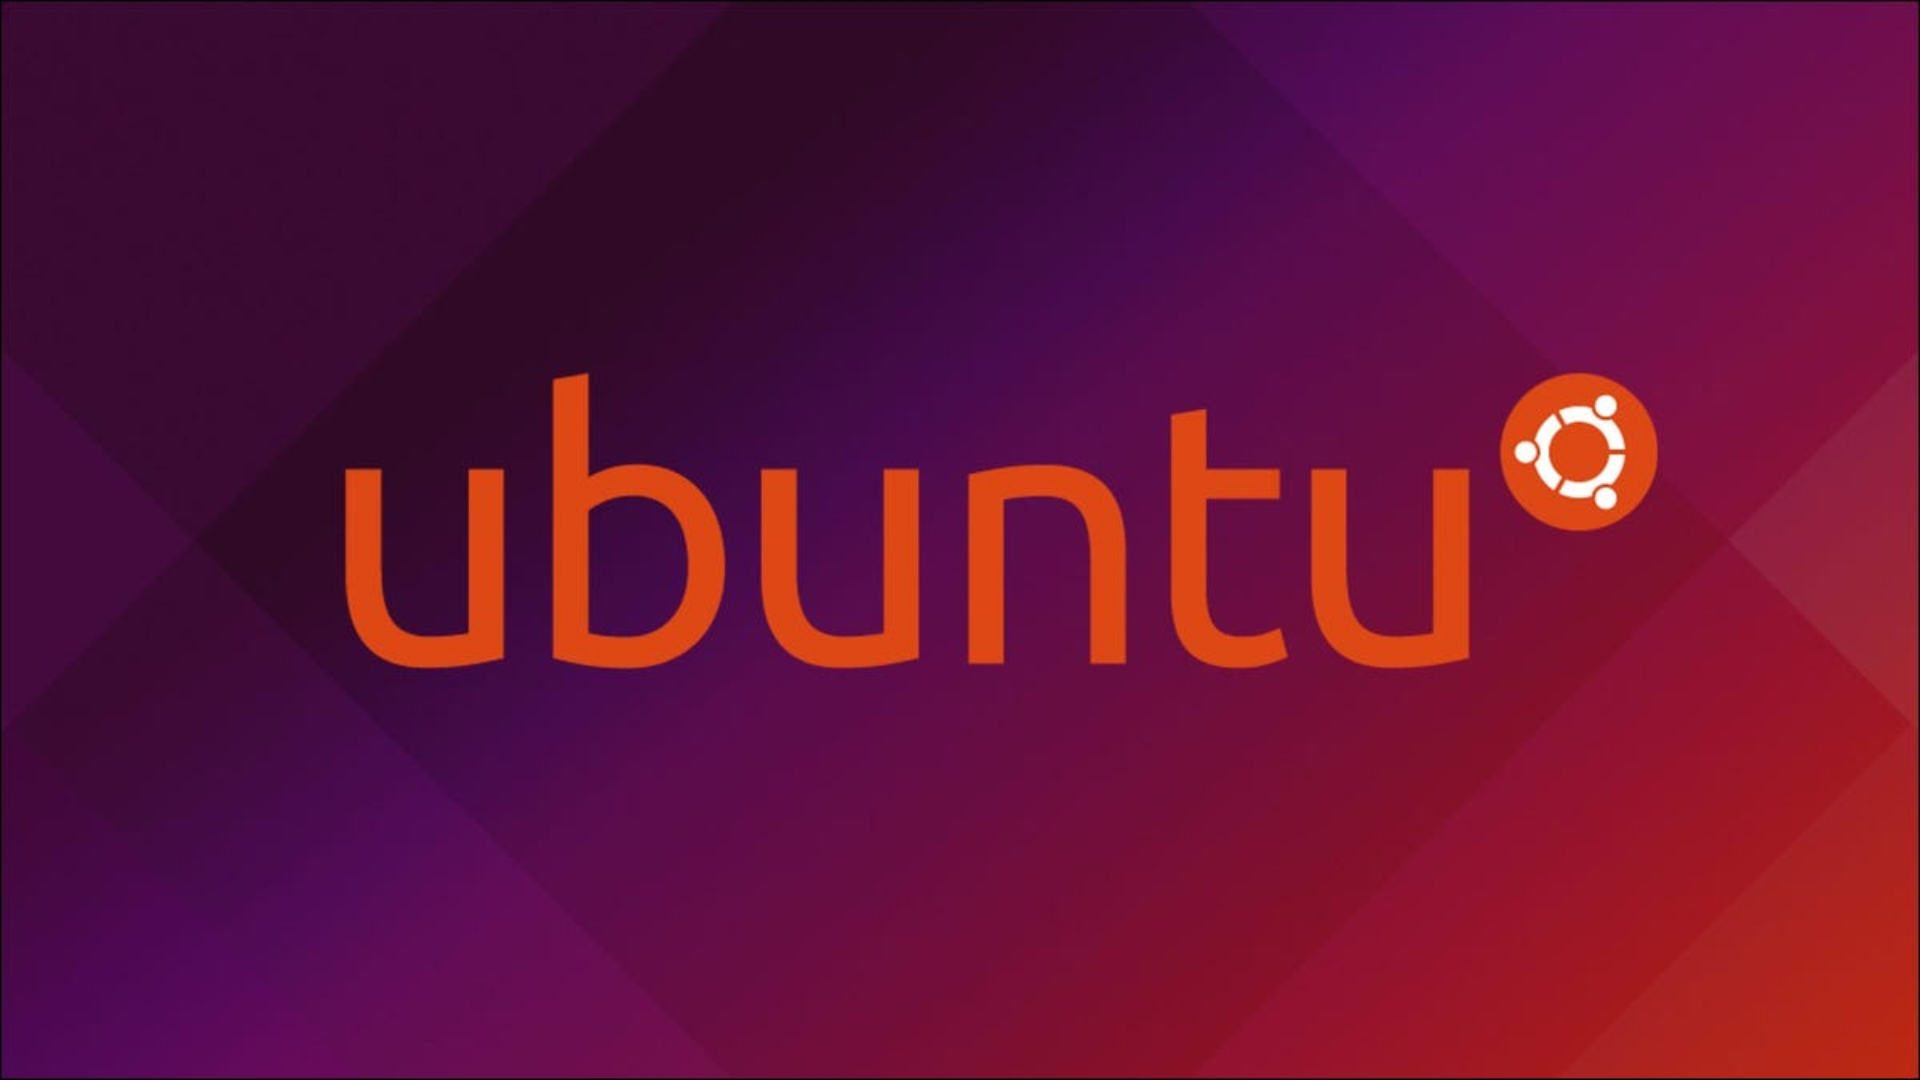 Ubuntu logo on gradient background